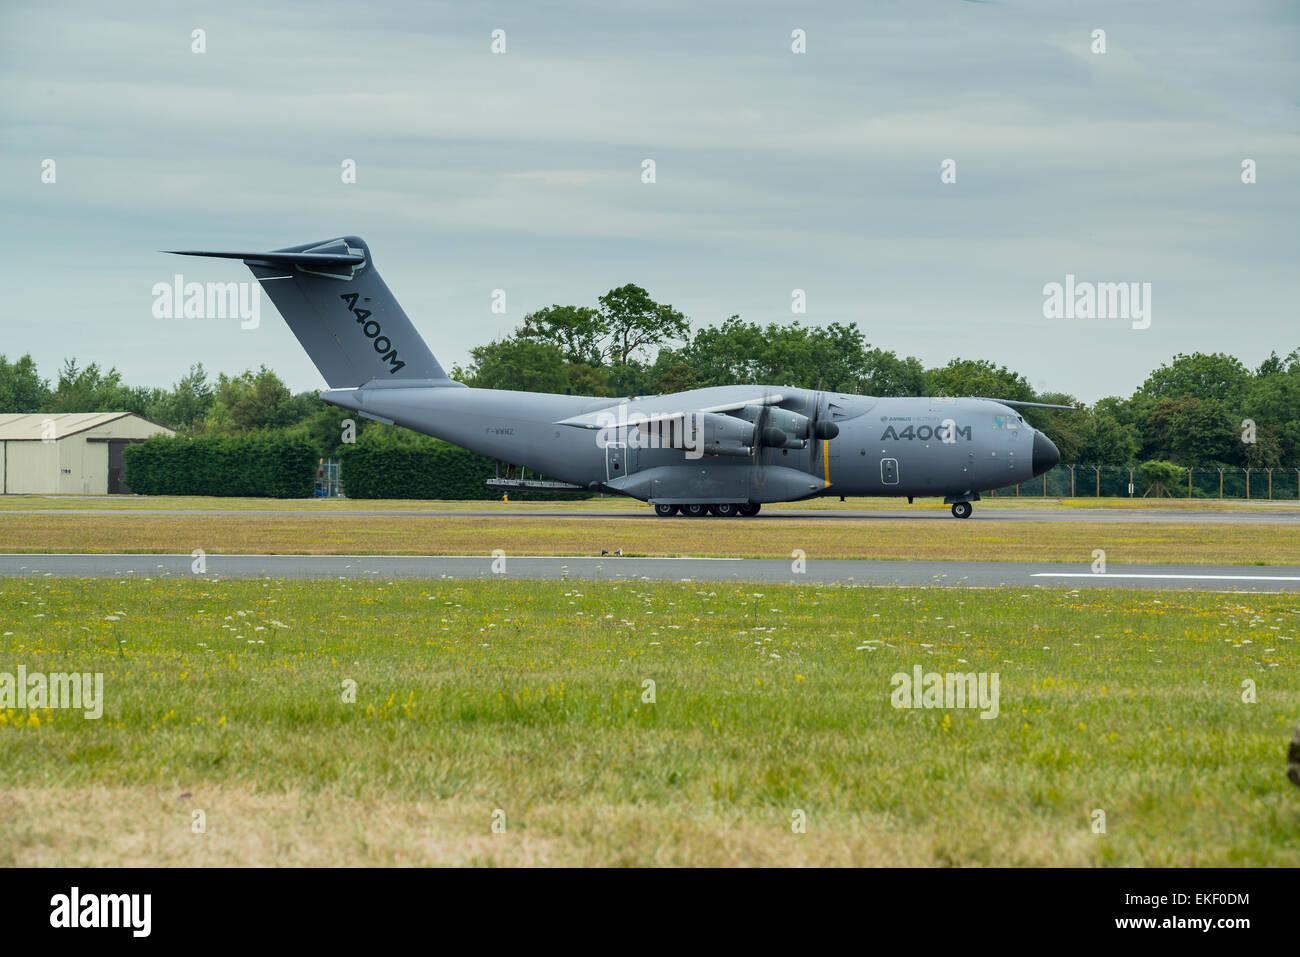 Airbus A400M RIAT 2014 - Stock Image